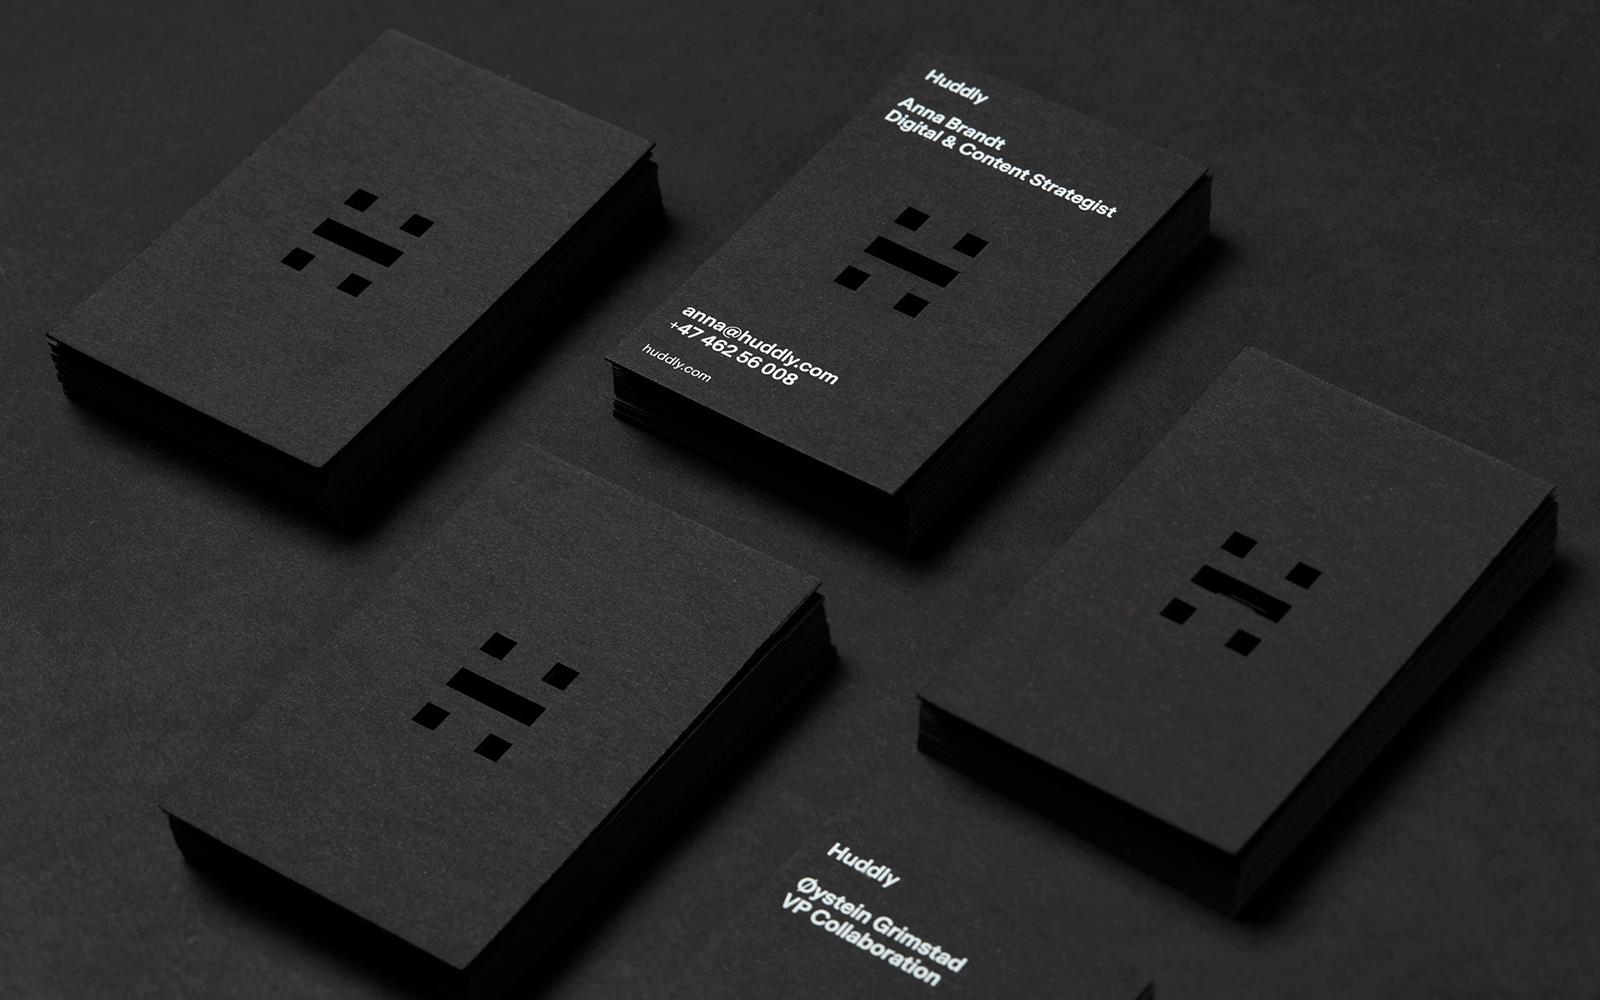 Huddy哈迪集团启用全新的品牌形象与VI系统设计-VI设计09